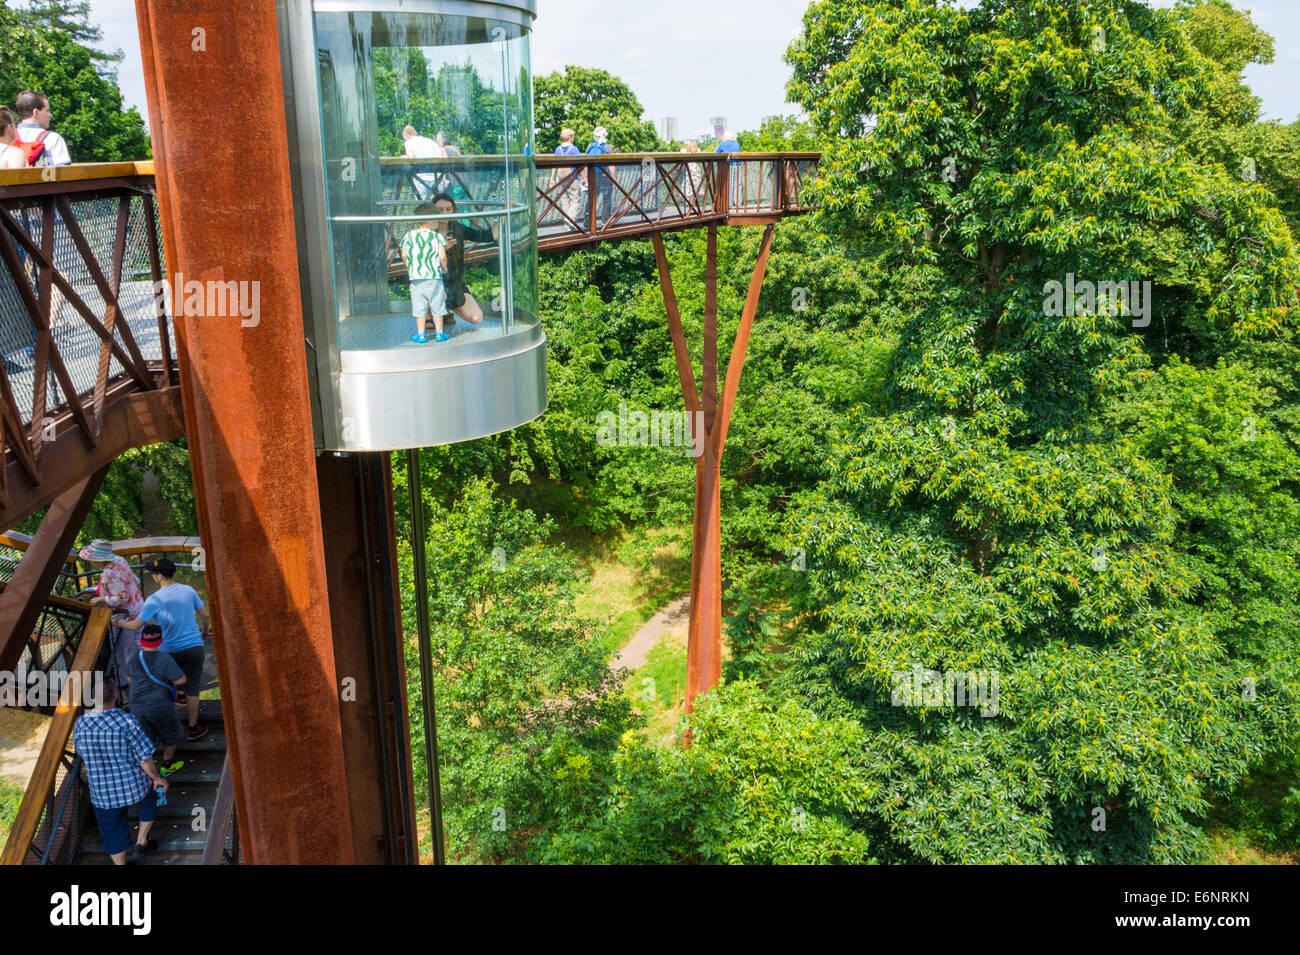 Rhizotron and Xstrata Treetop Walkway Kew Gardens London England UK GB EU Europe - Stock Image